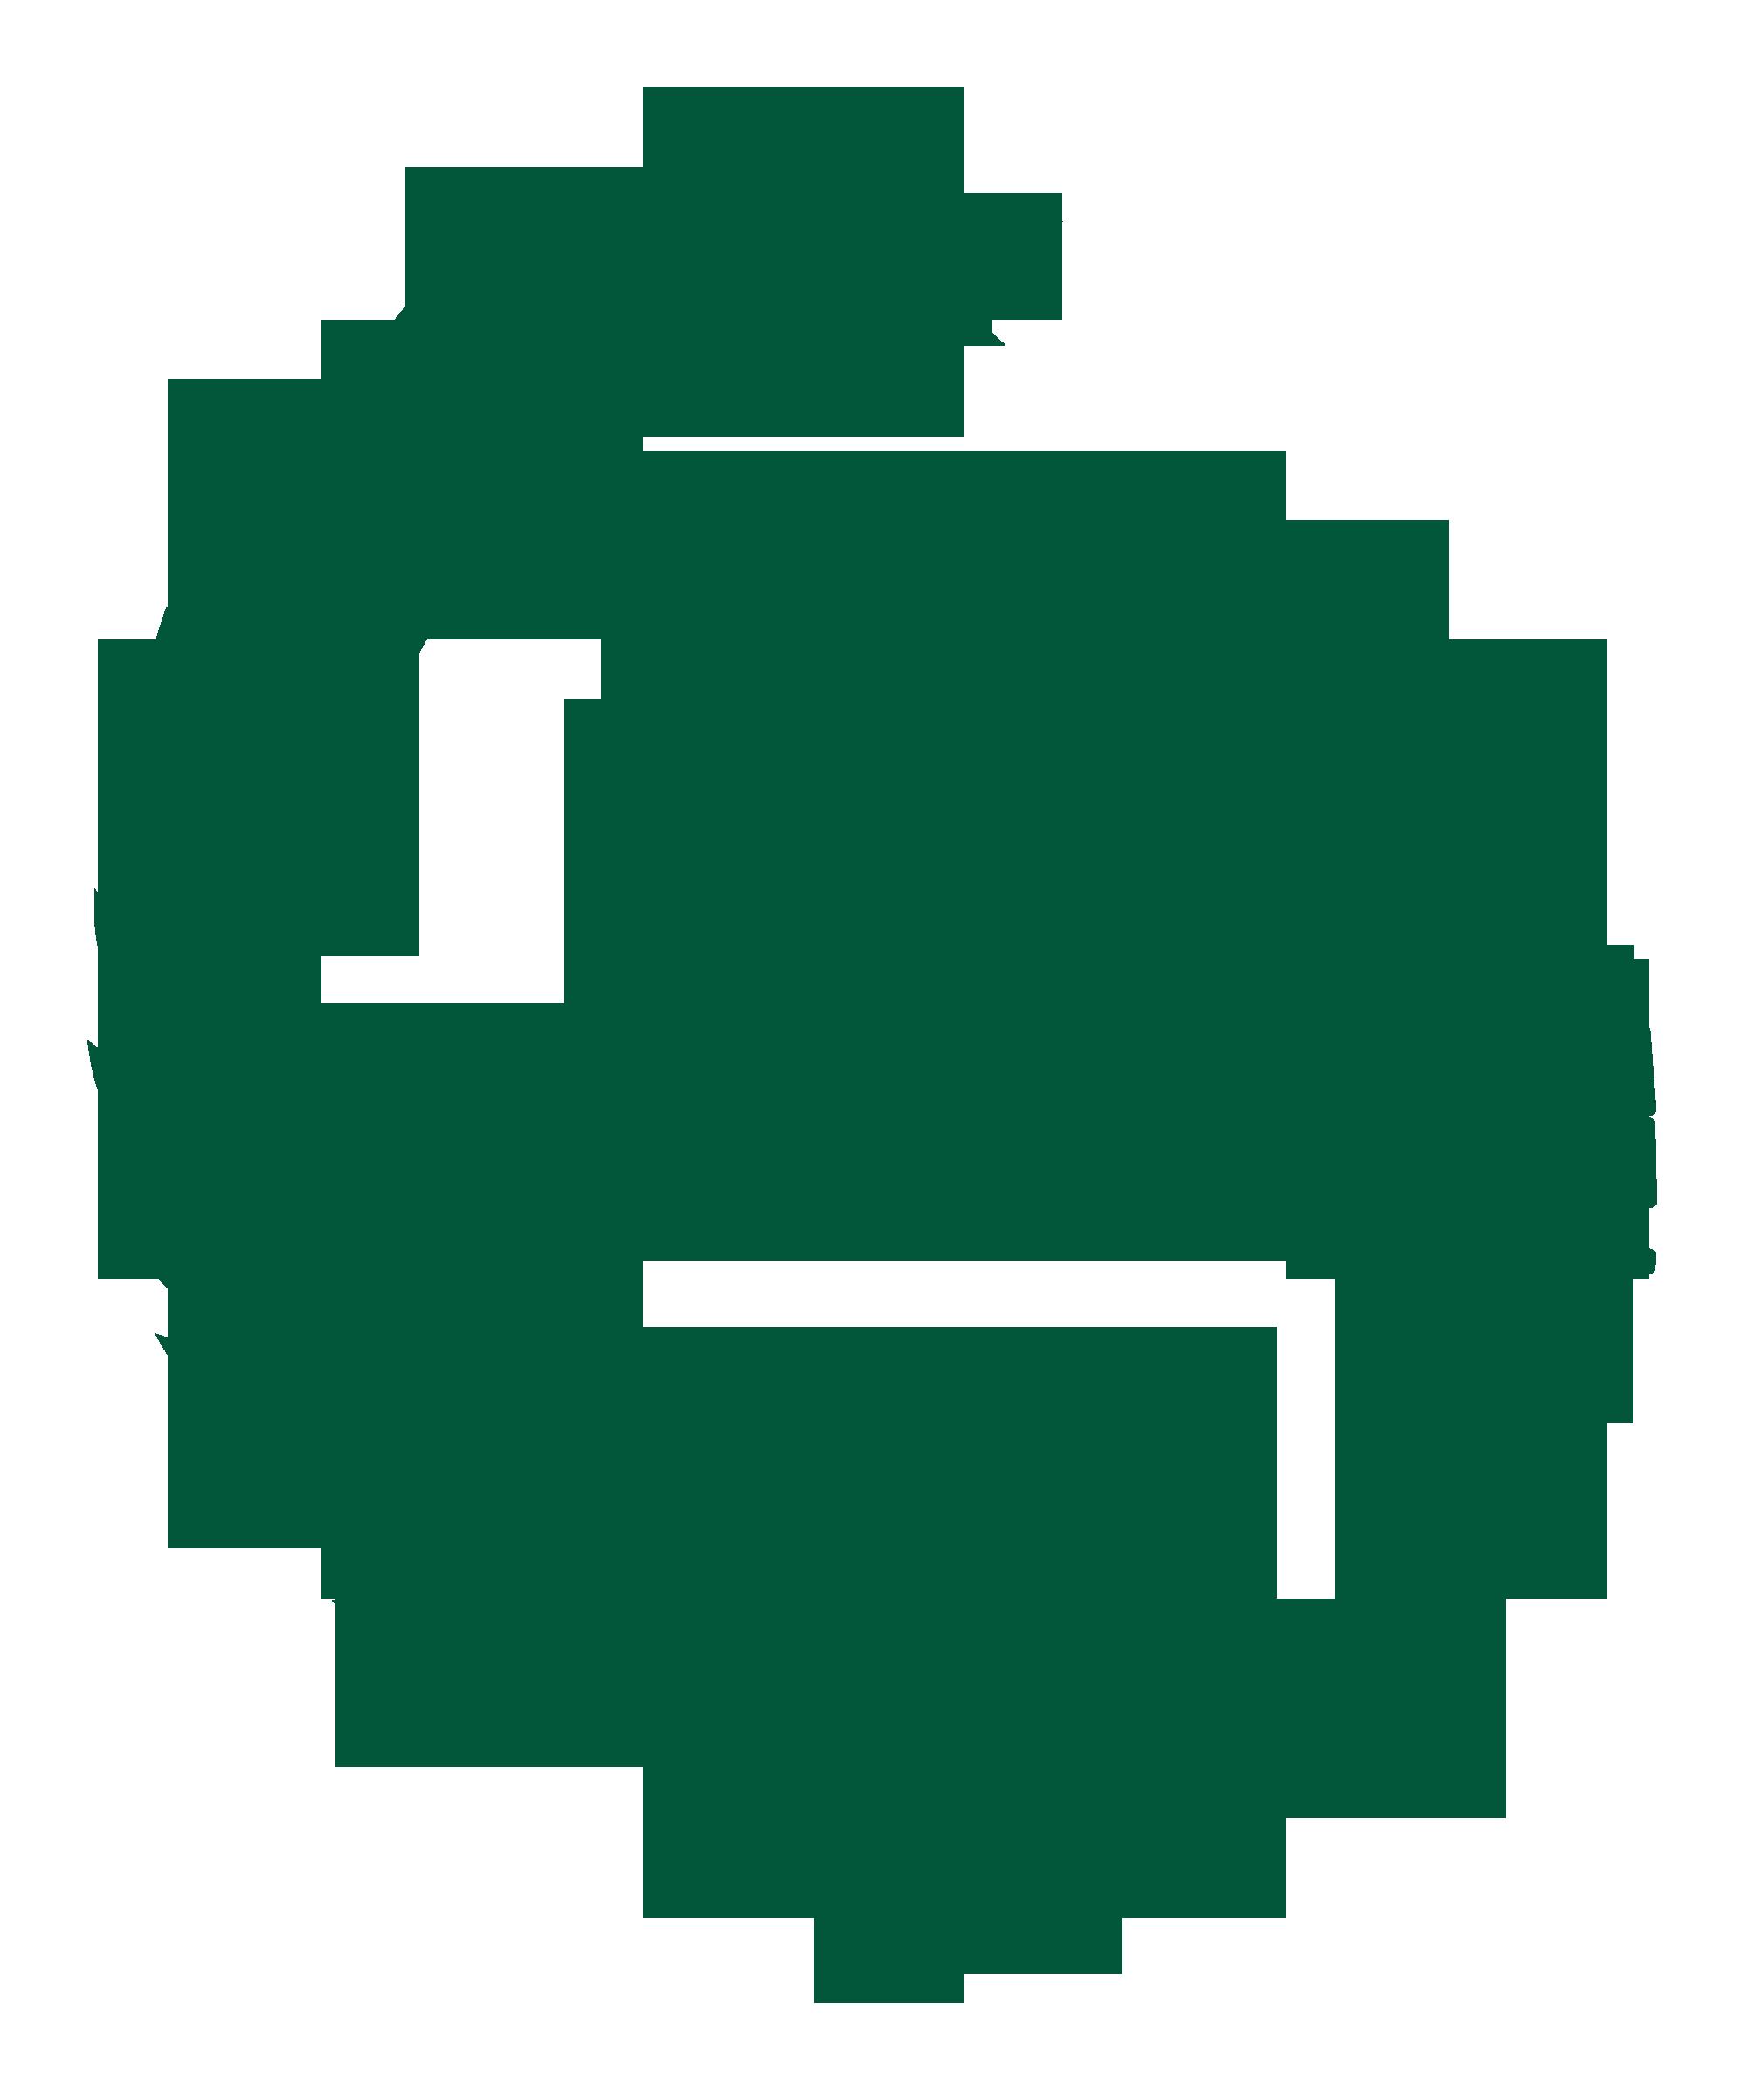 logo school png clipart best